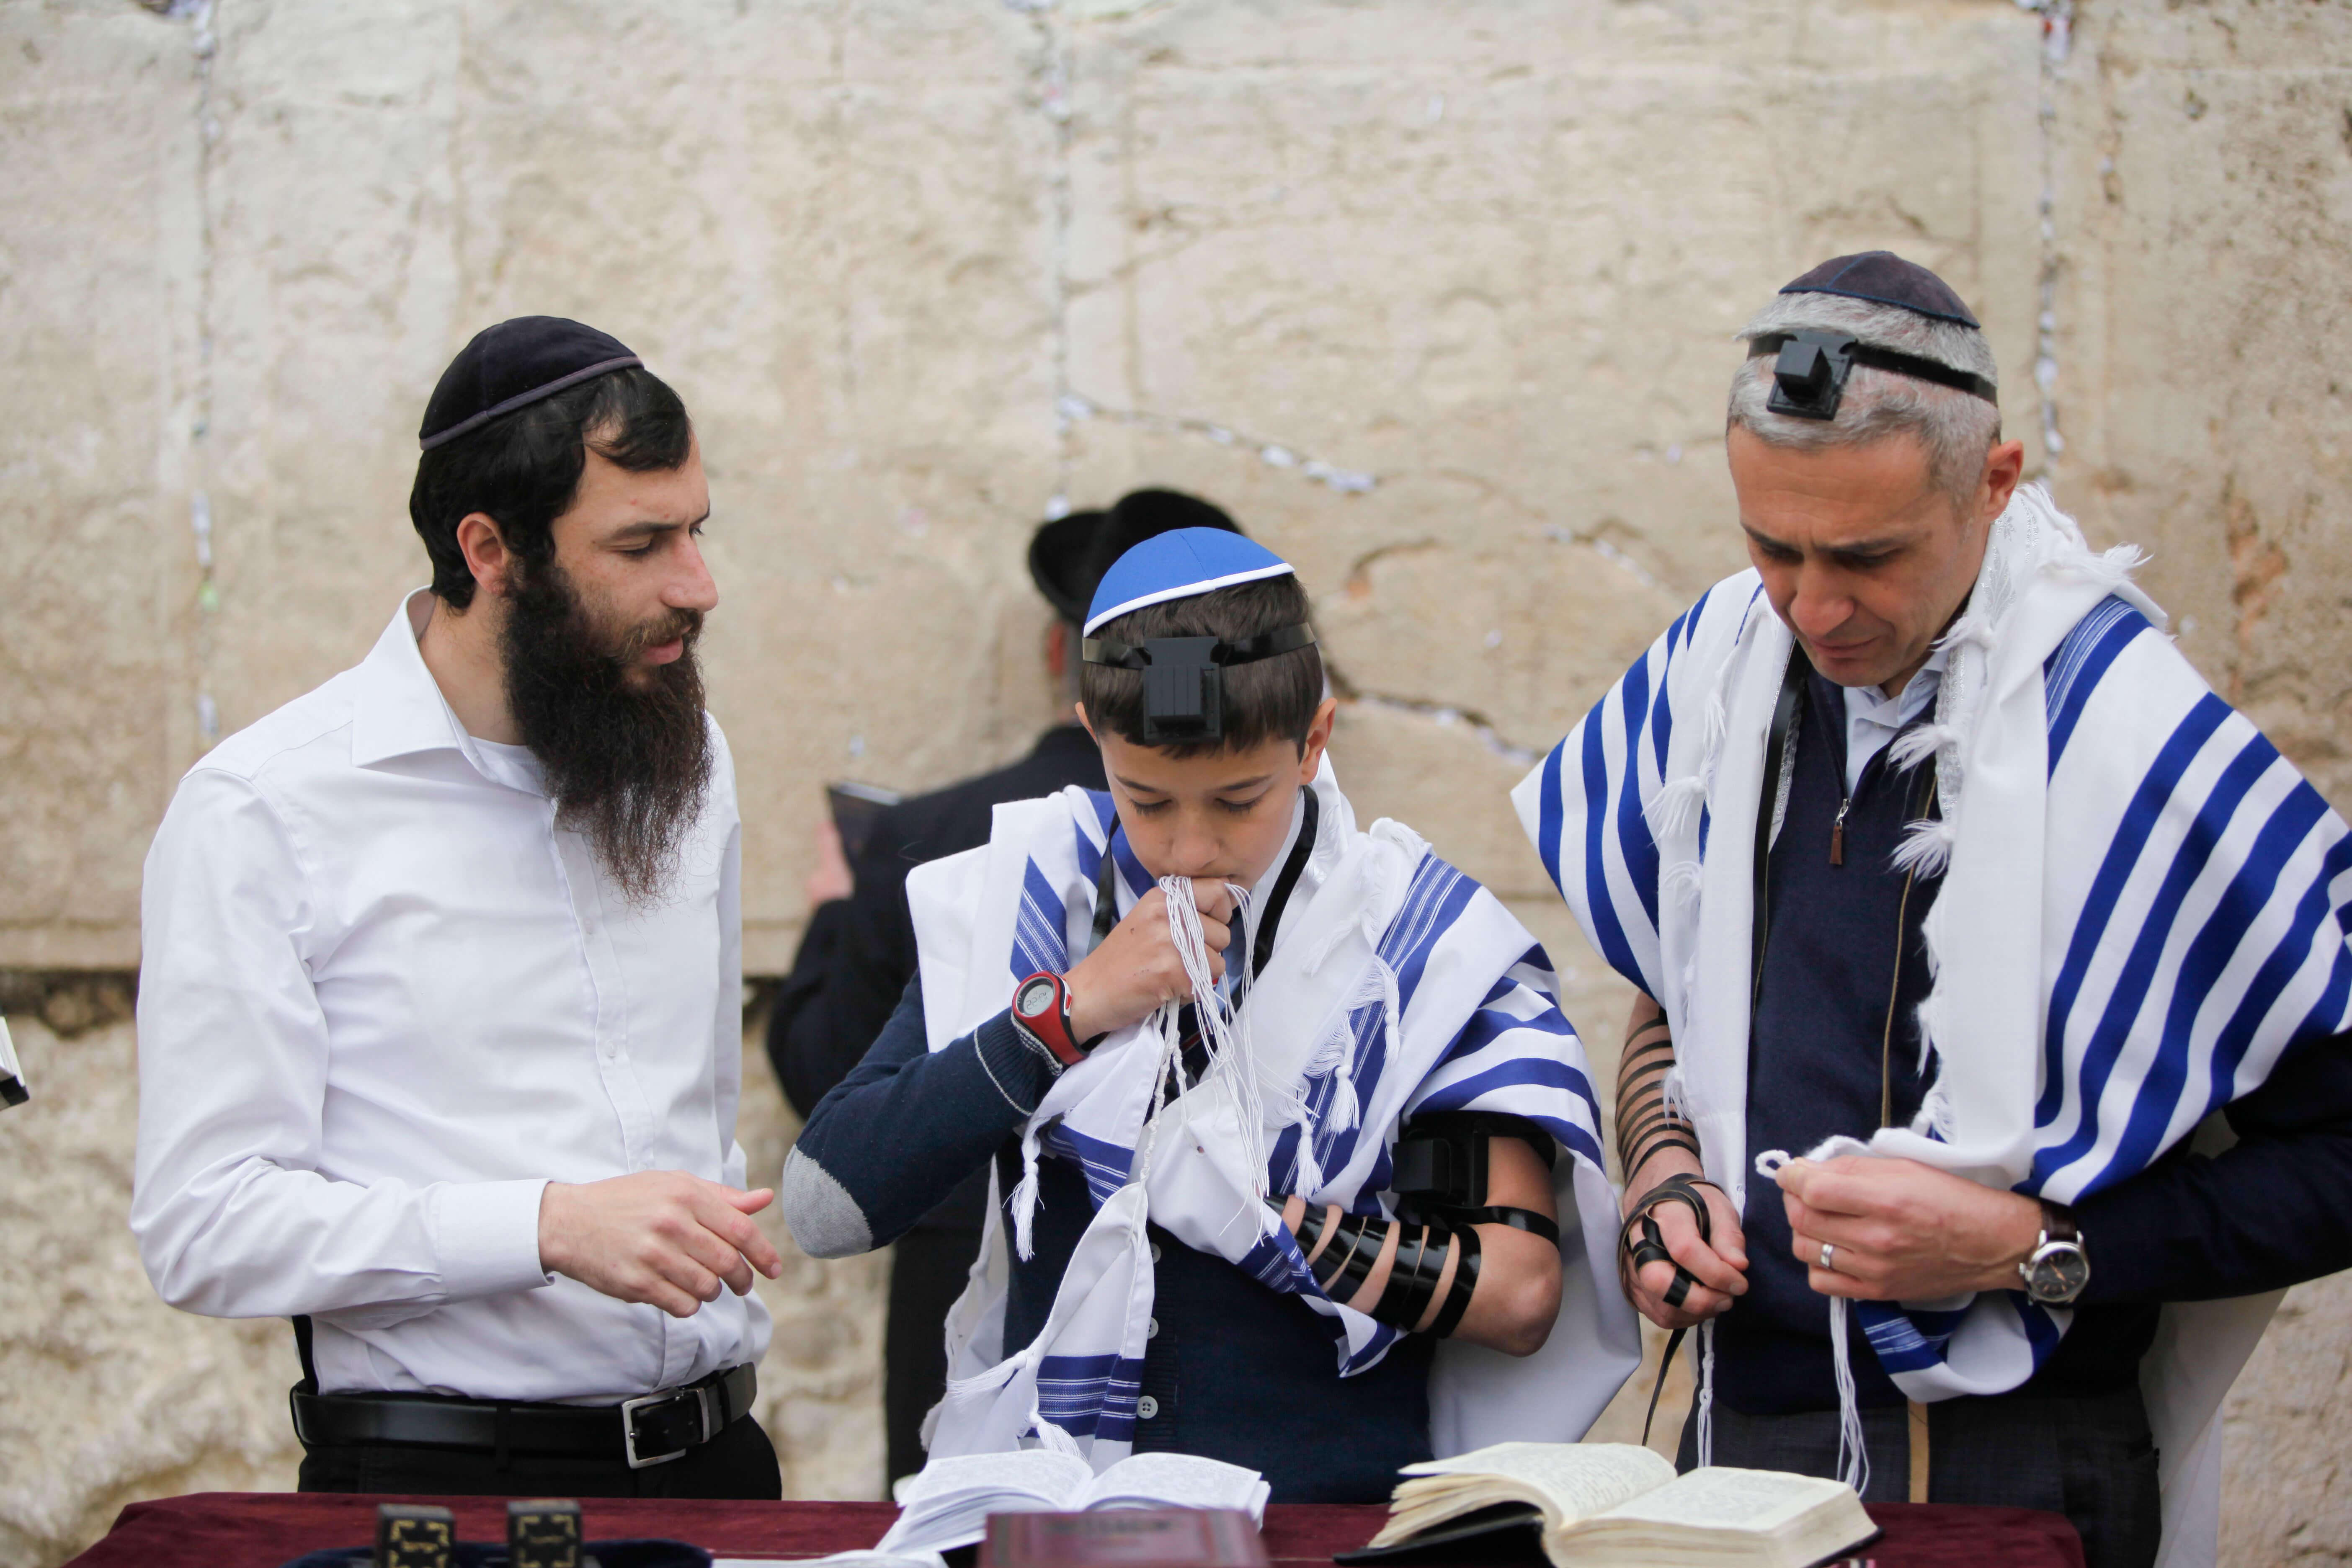 Joodse cultuur vakanties israel - Feestelijke bar ...